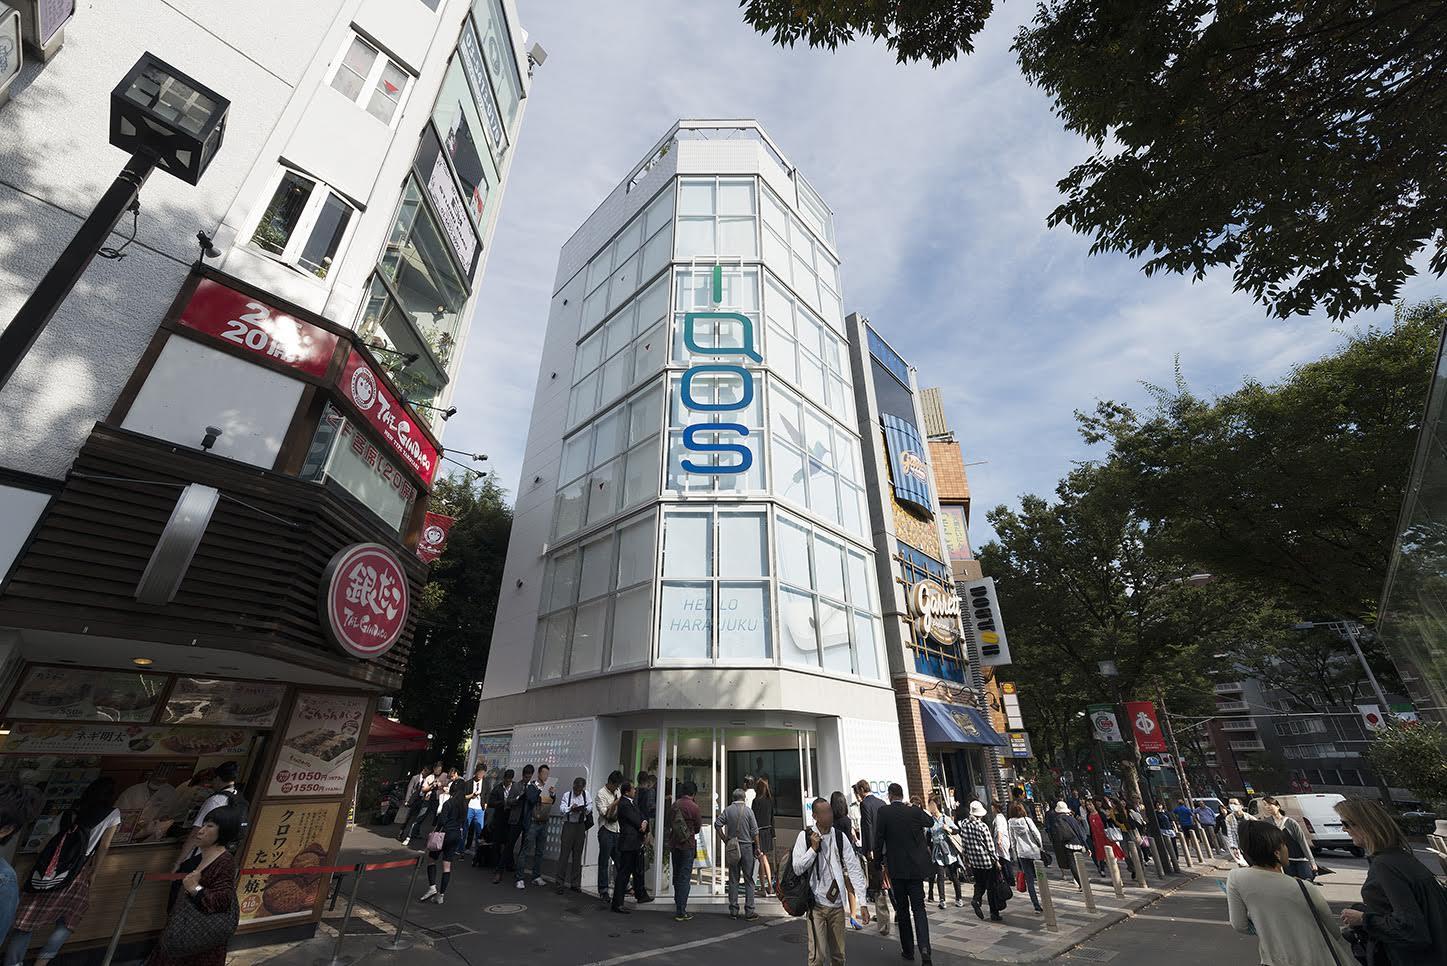 Philip Morris takes cigarette alternative to South Korea